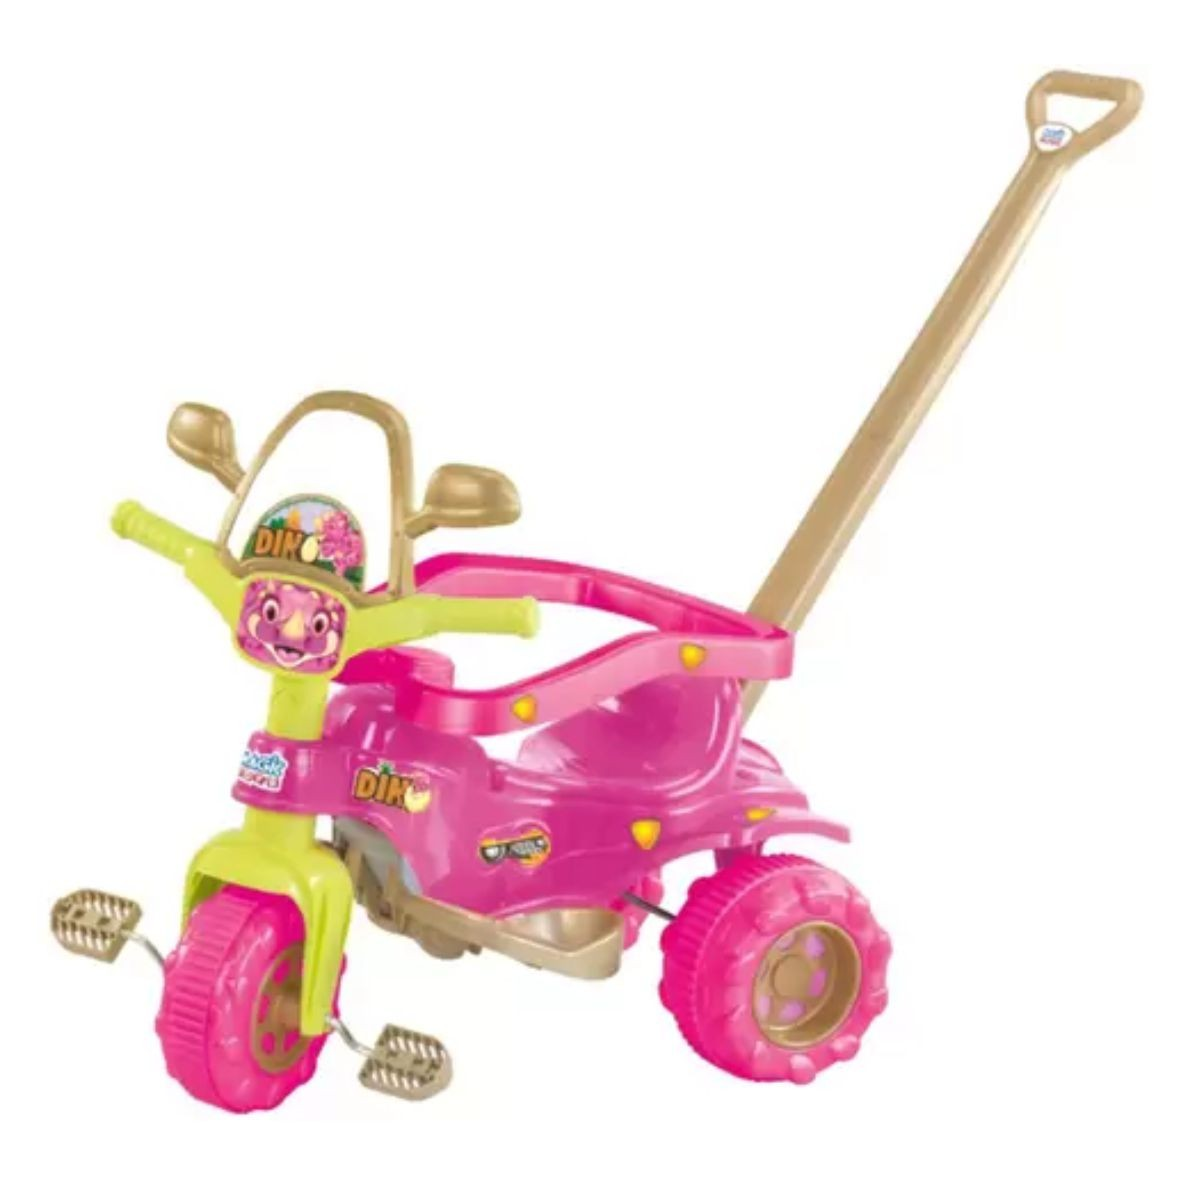 Triciclo Tico Tico Dino Pink - Magic Toys